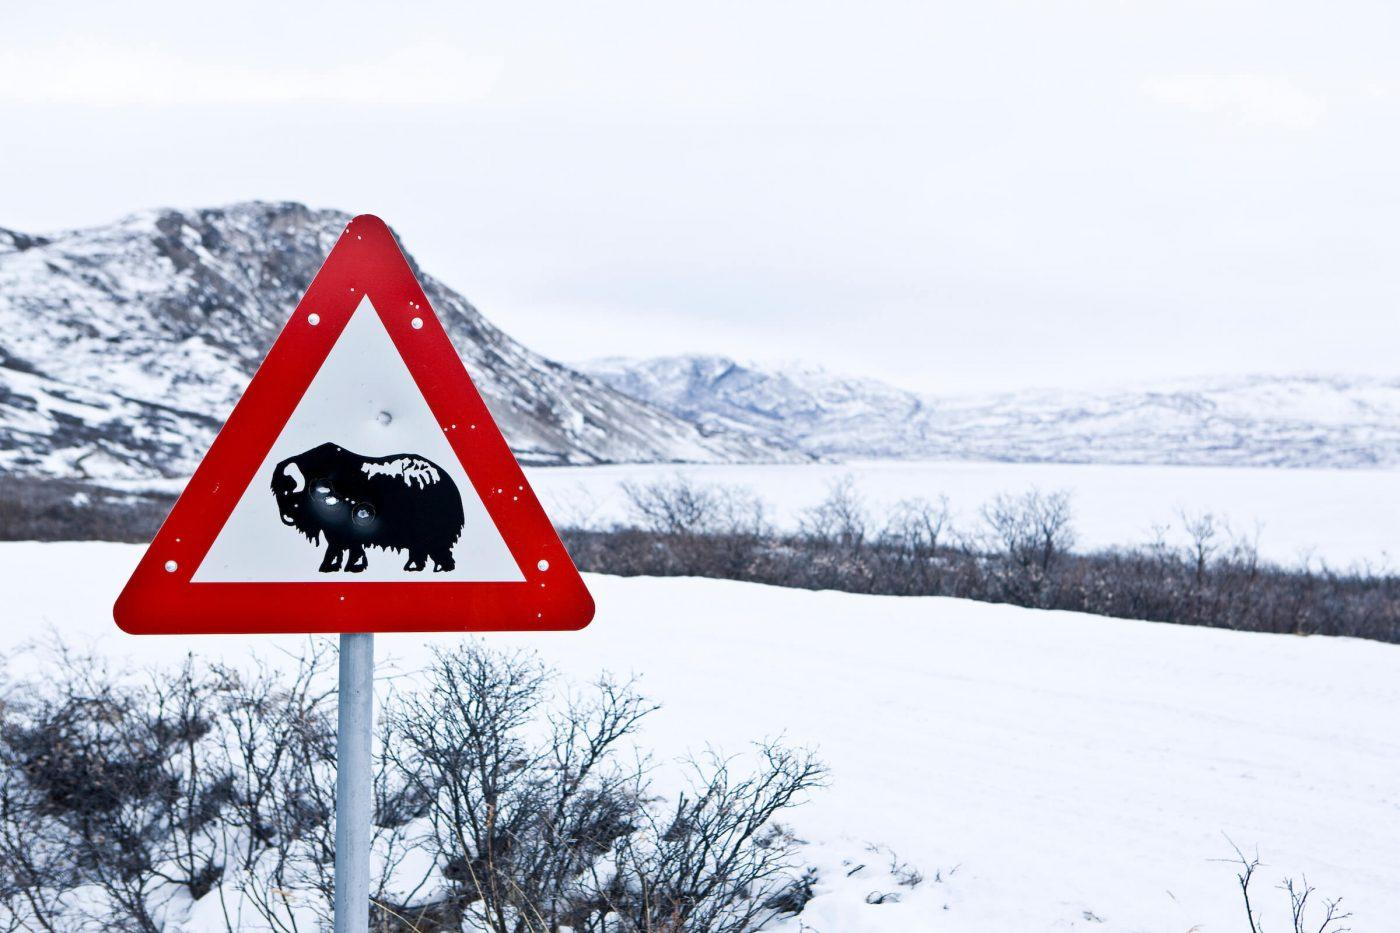 Kangerlussuaq Winter Muskox sign. Photo by Per Arnesen - Visit Greenland